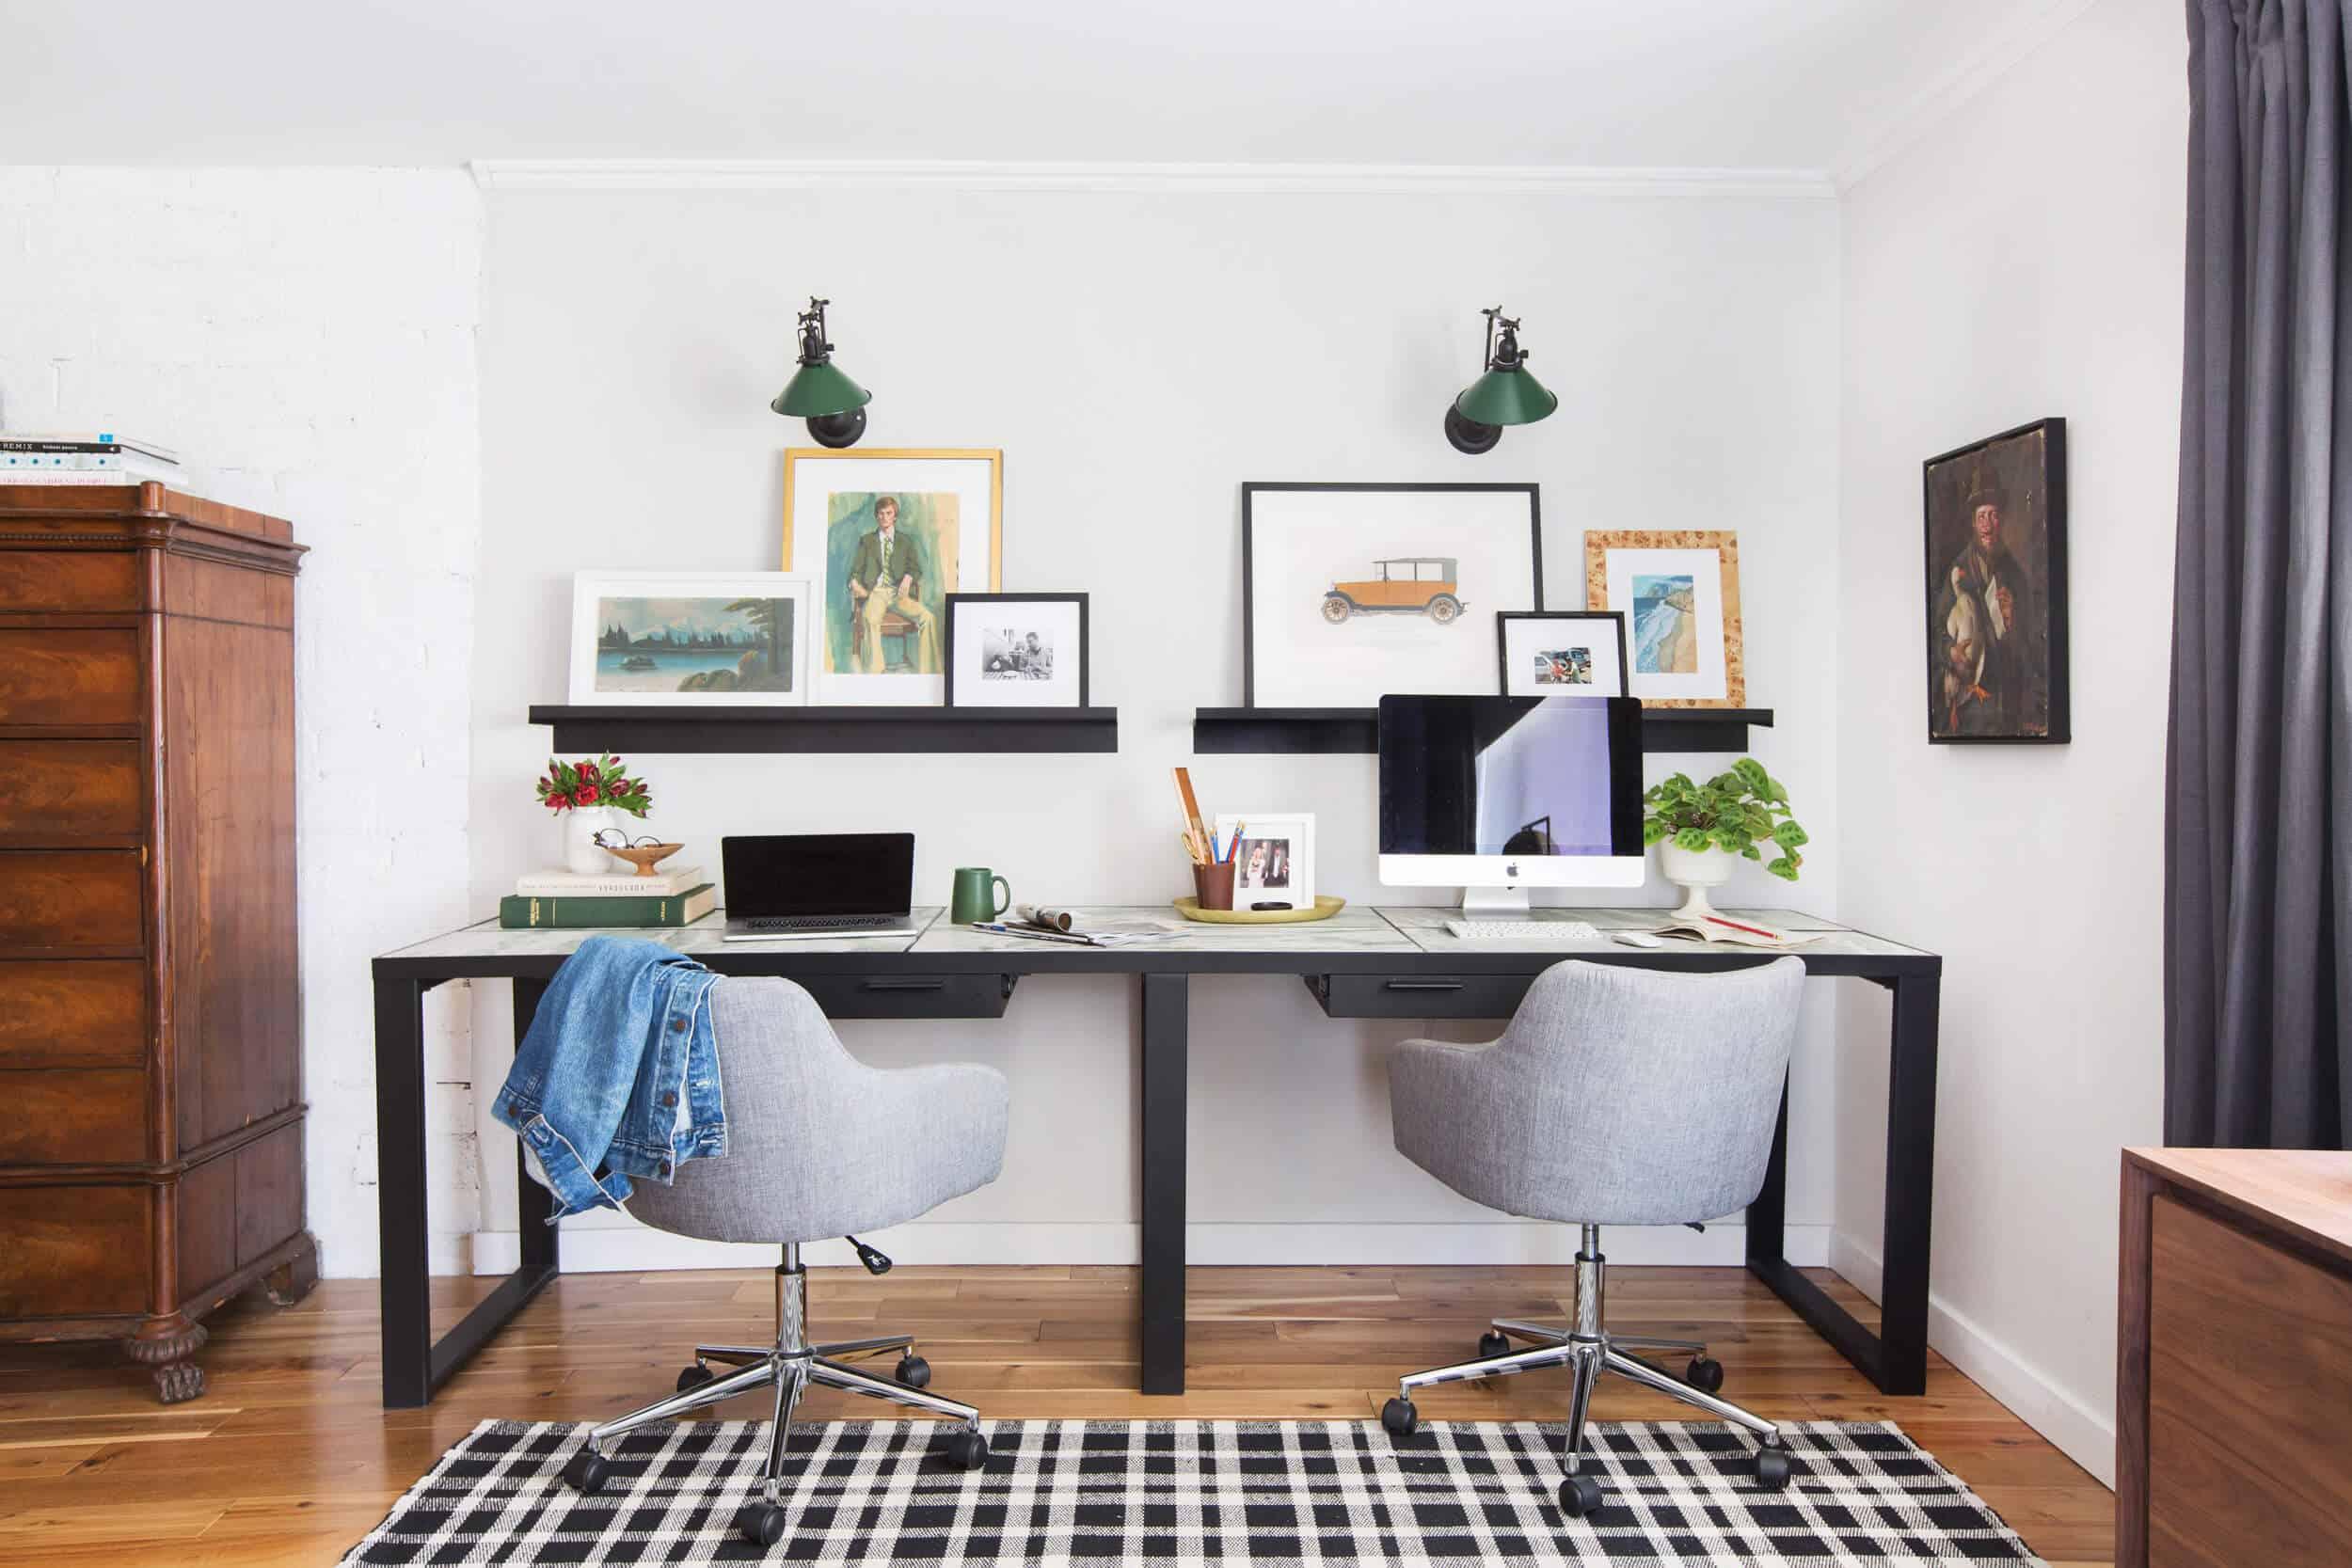 Emily Henderson_Framebridge_Art Ledge_Brians Office_Masculine Office_Guy_Green_Plaid Rug_Workspace_Modern_Eclectic_1